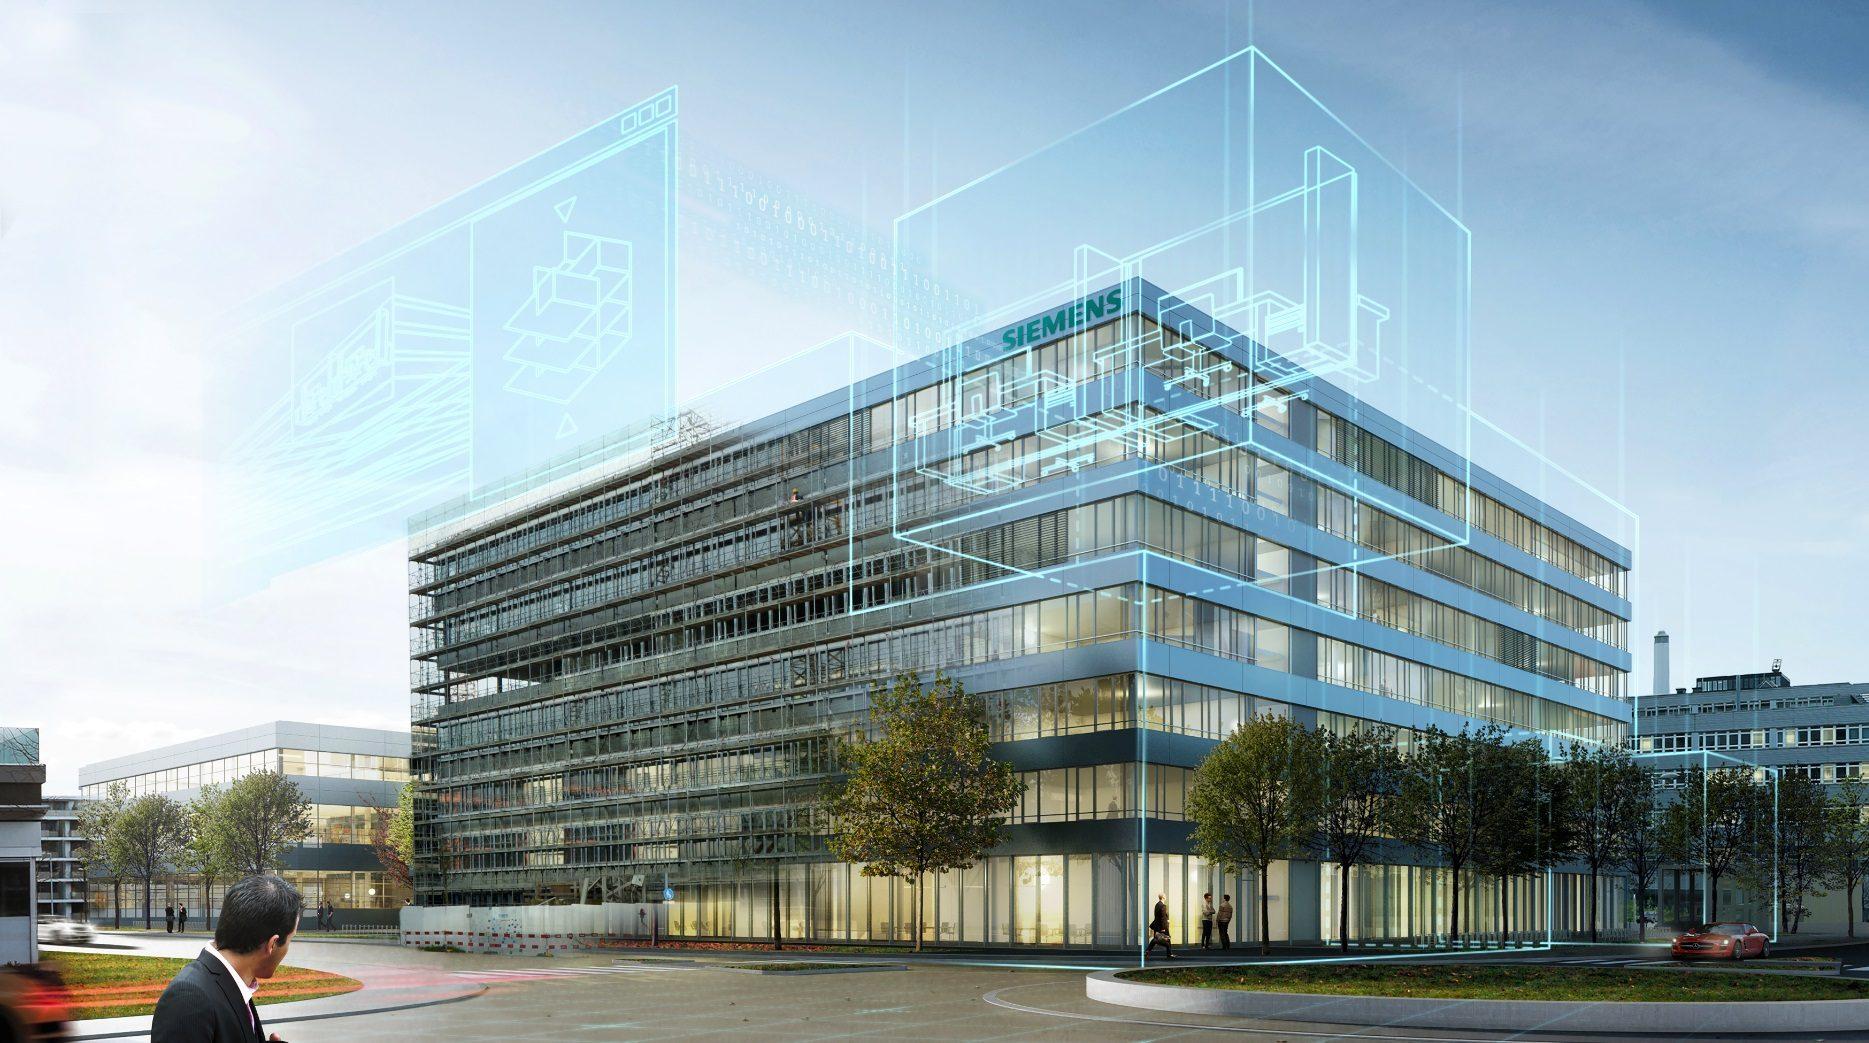 building-information-modelling-bim-digital-twin